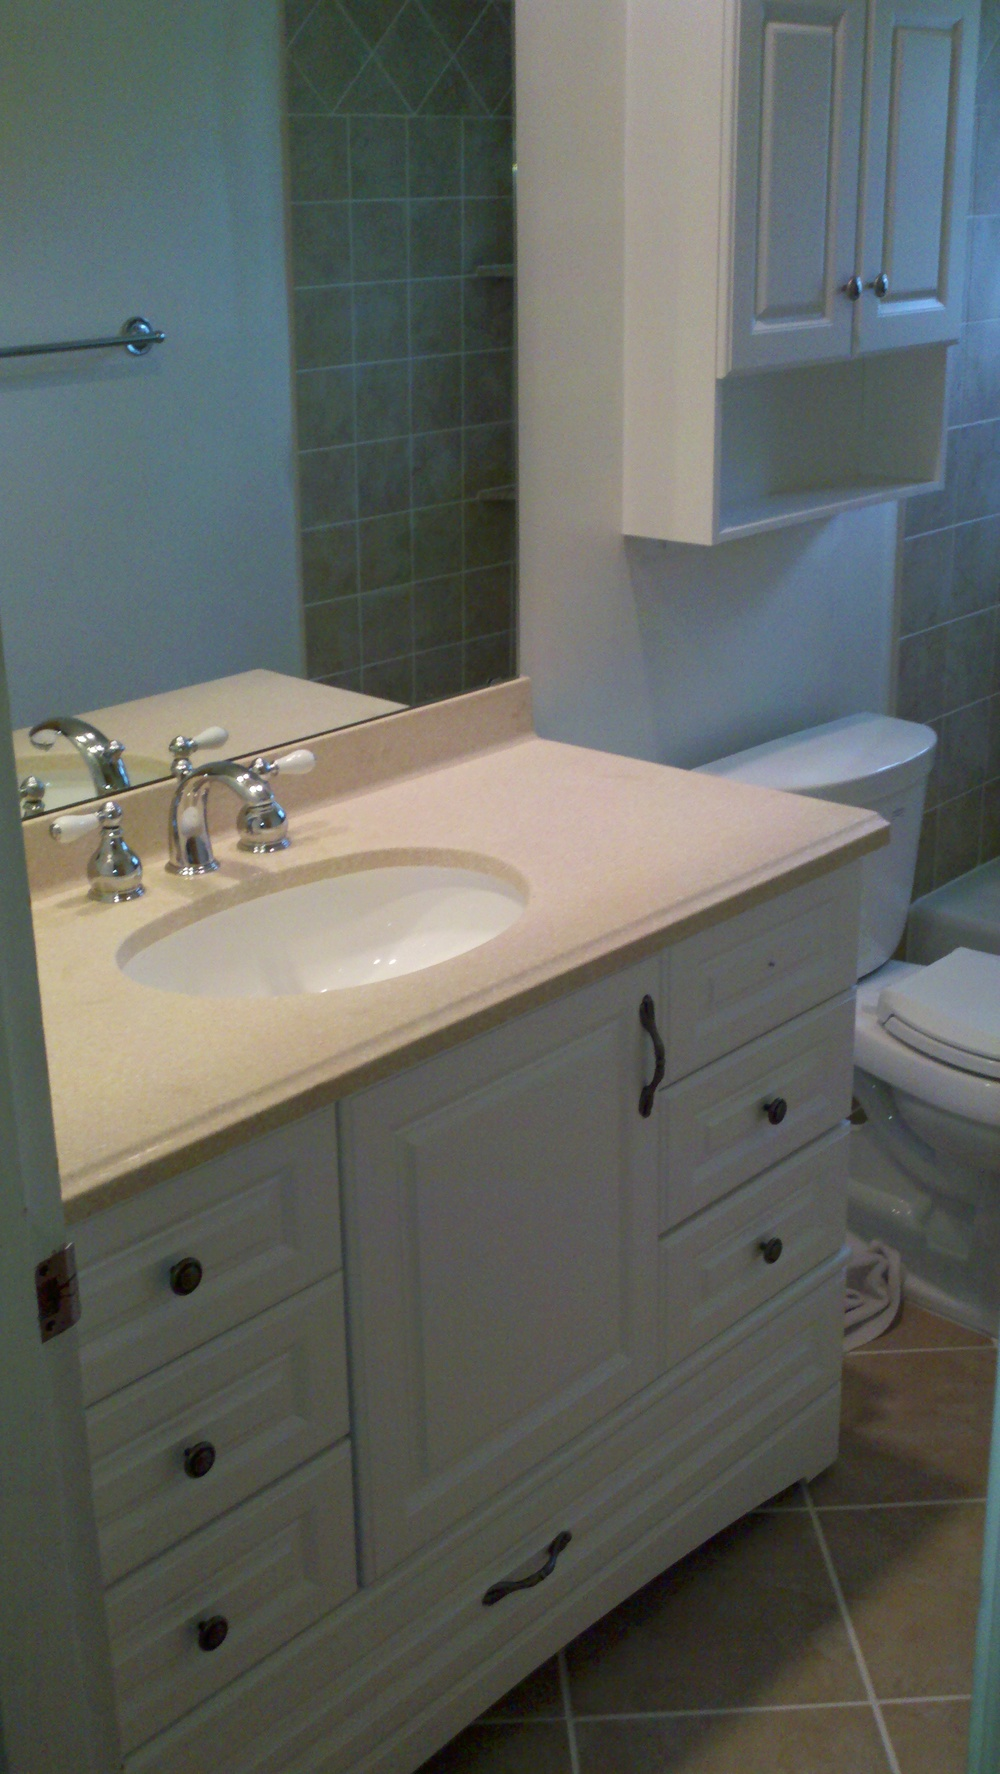 Crestview Hills Bathroom Sink Install